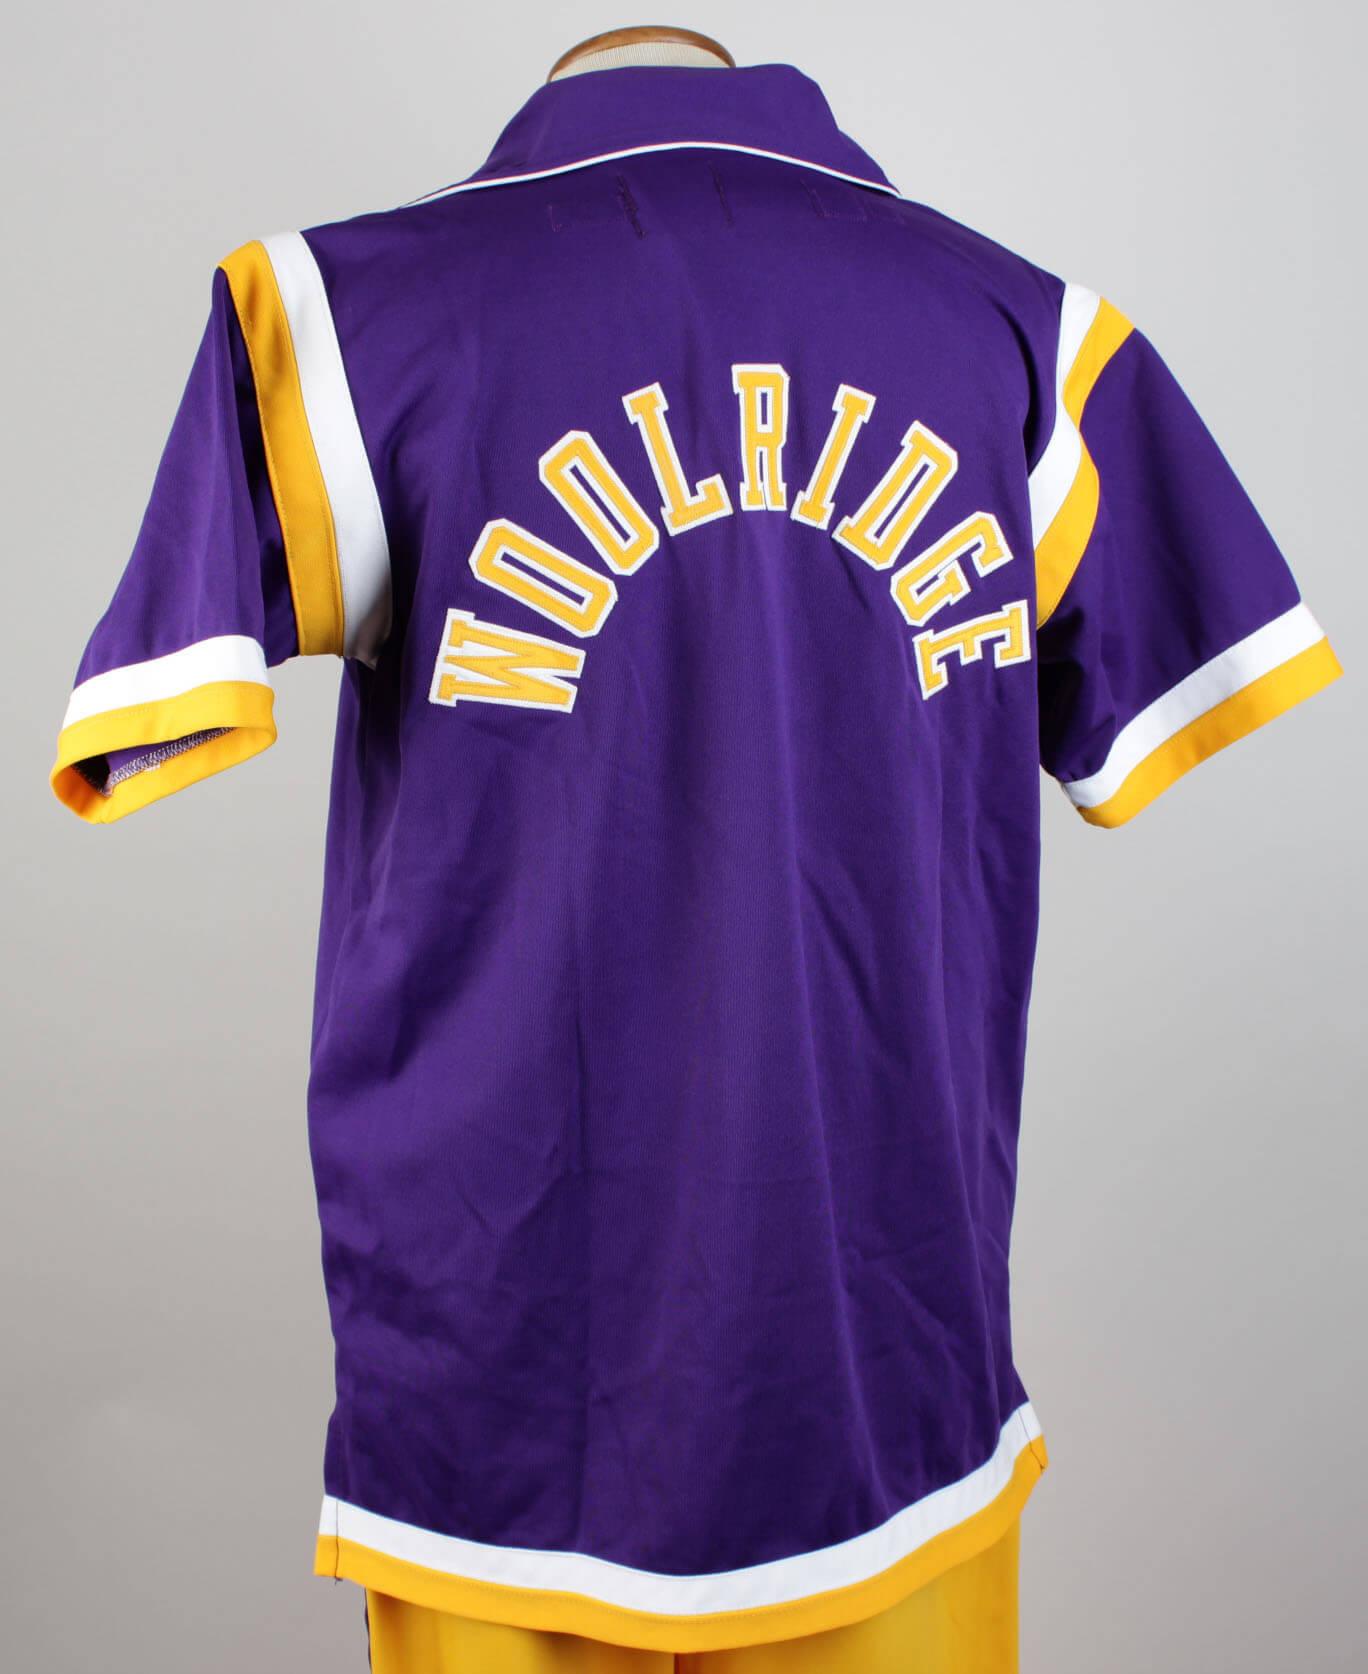 1988 Los Angeles Lakers Orlando Woolridge Game Worn Warm up Jacket